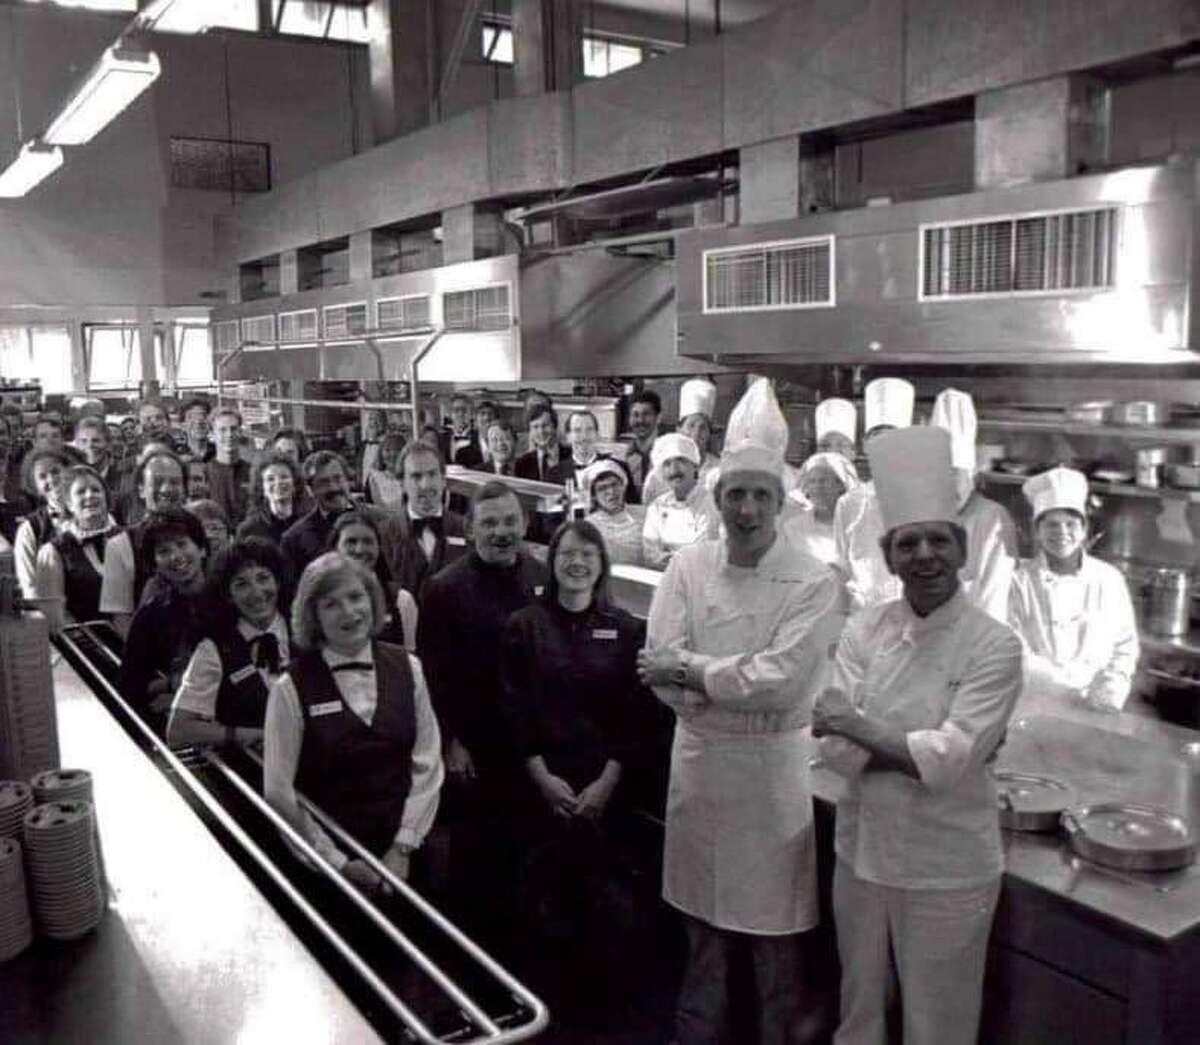 Executive chef Bertram Wentzek and the Ahwahnee Hotel kitchen staff during a Bracebridge dinner in the 1980s.